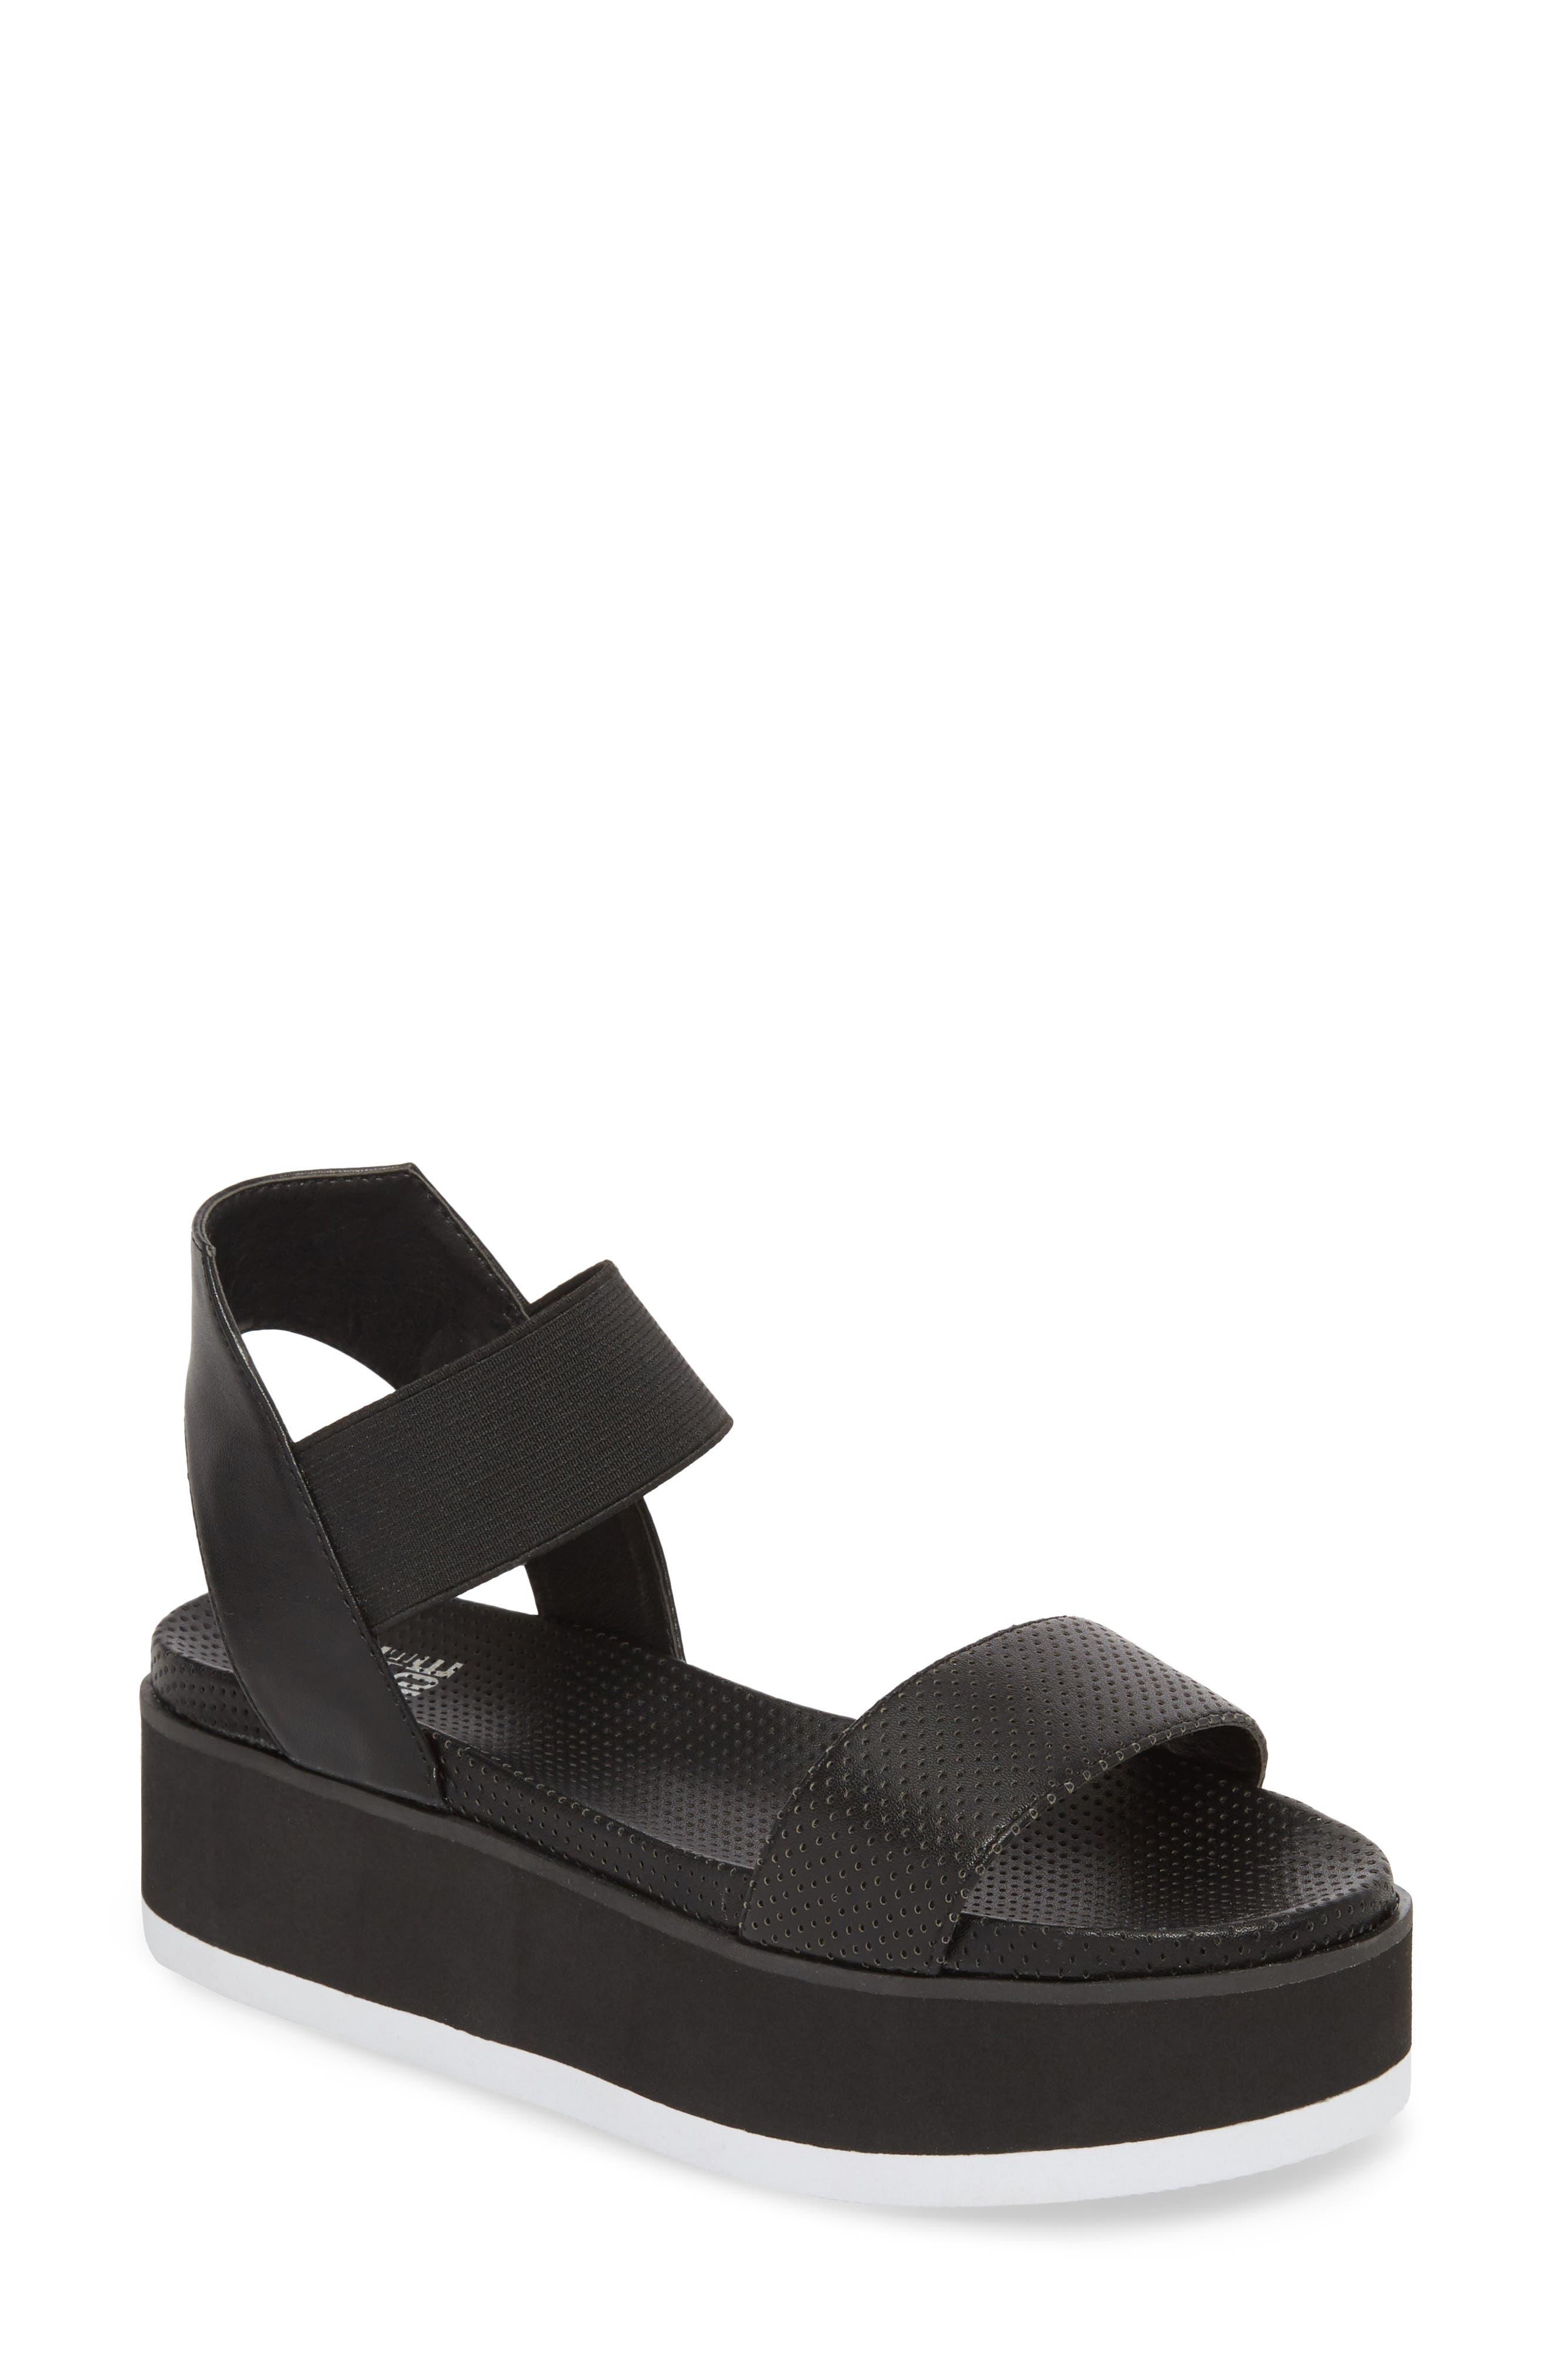 Josie Perforated Platform Sandal,                         Main,                         color, BLACK